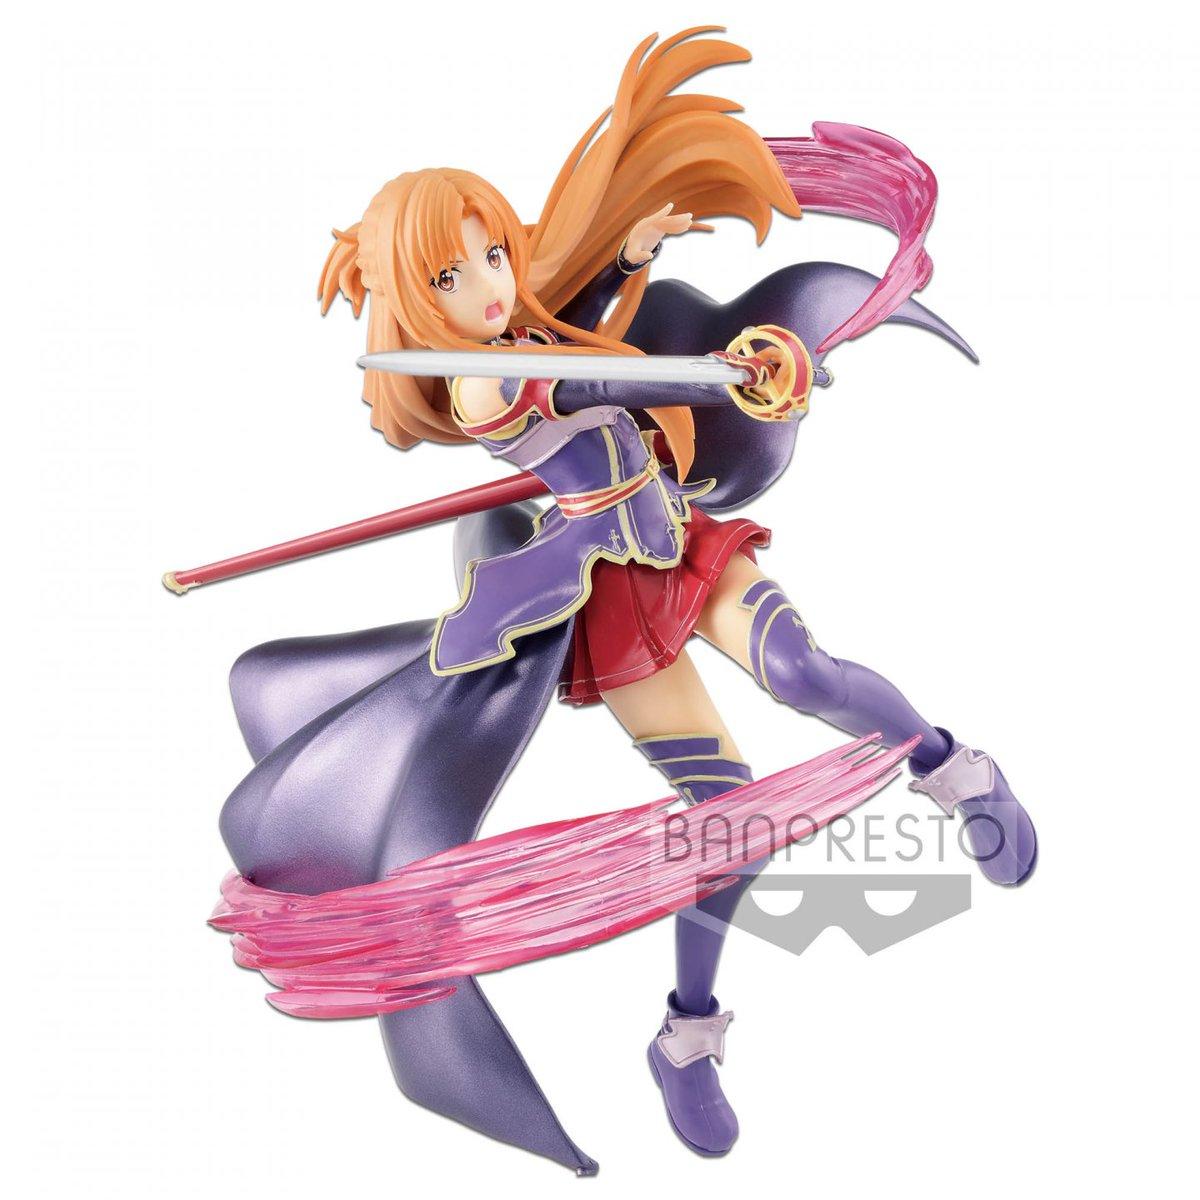 Sword Art Online Banpresto - Asuna Espresto EST Extra Motions Figure SAO